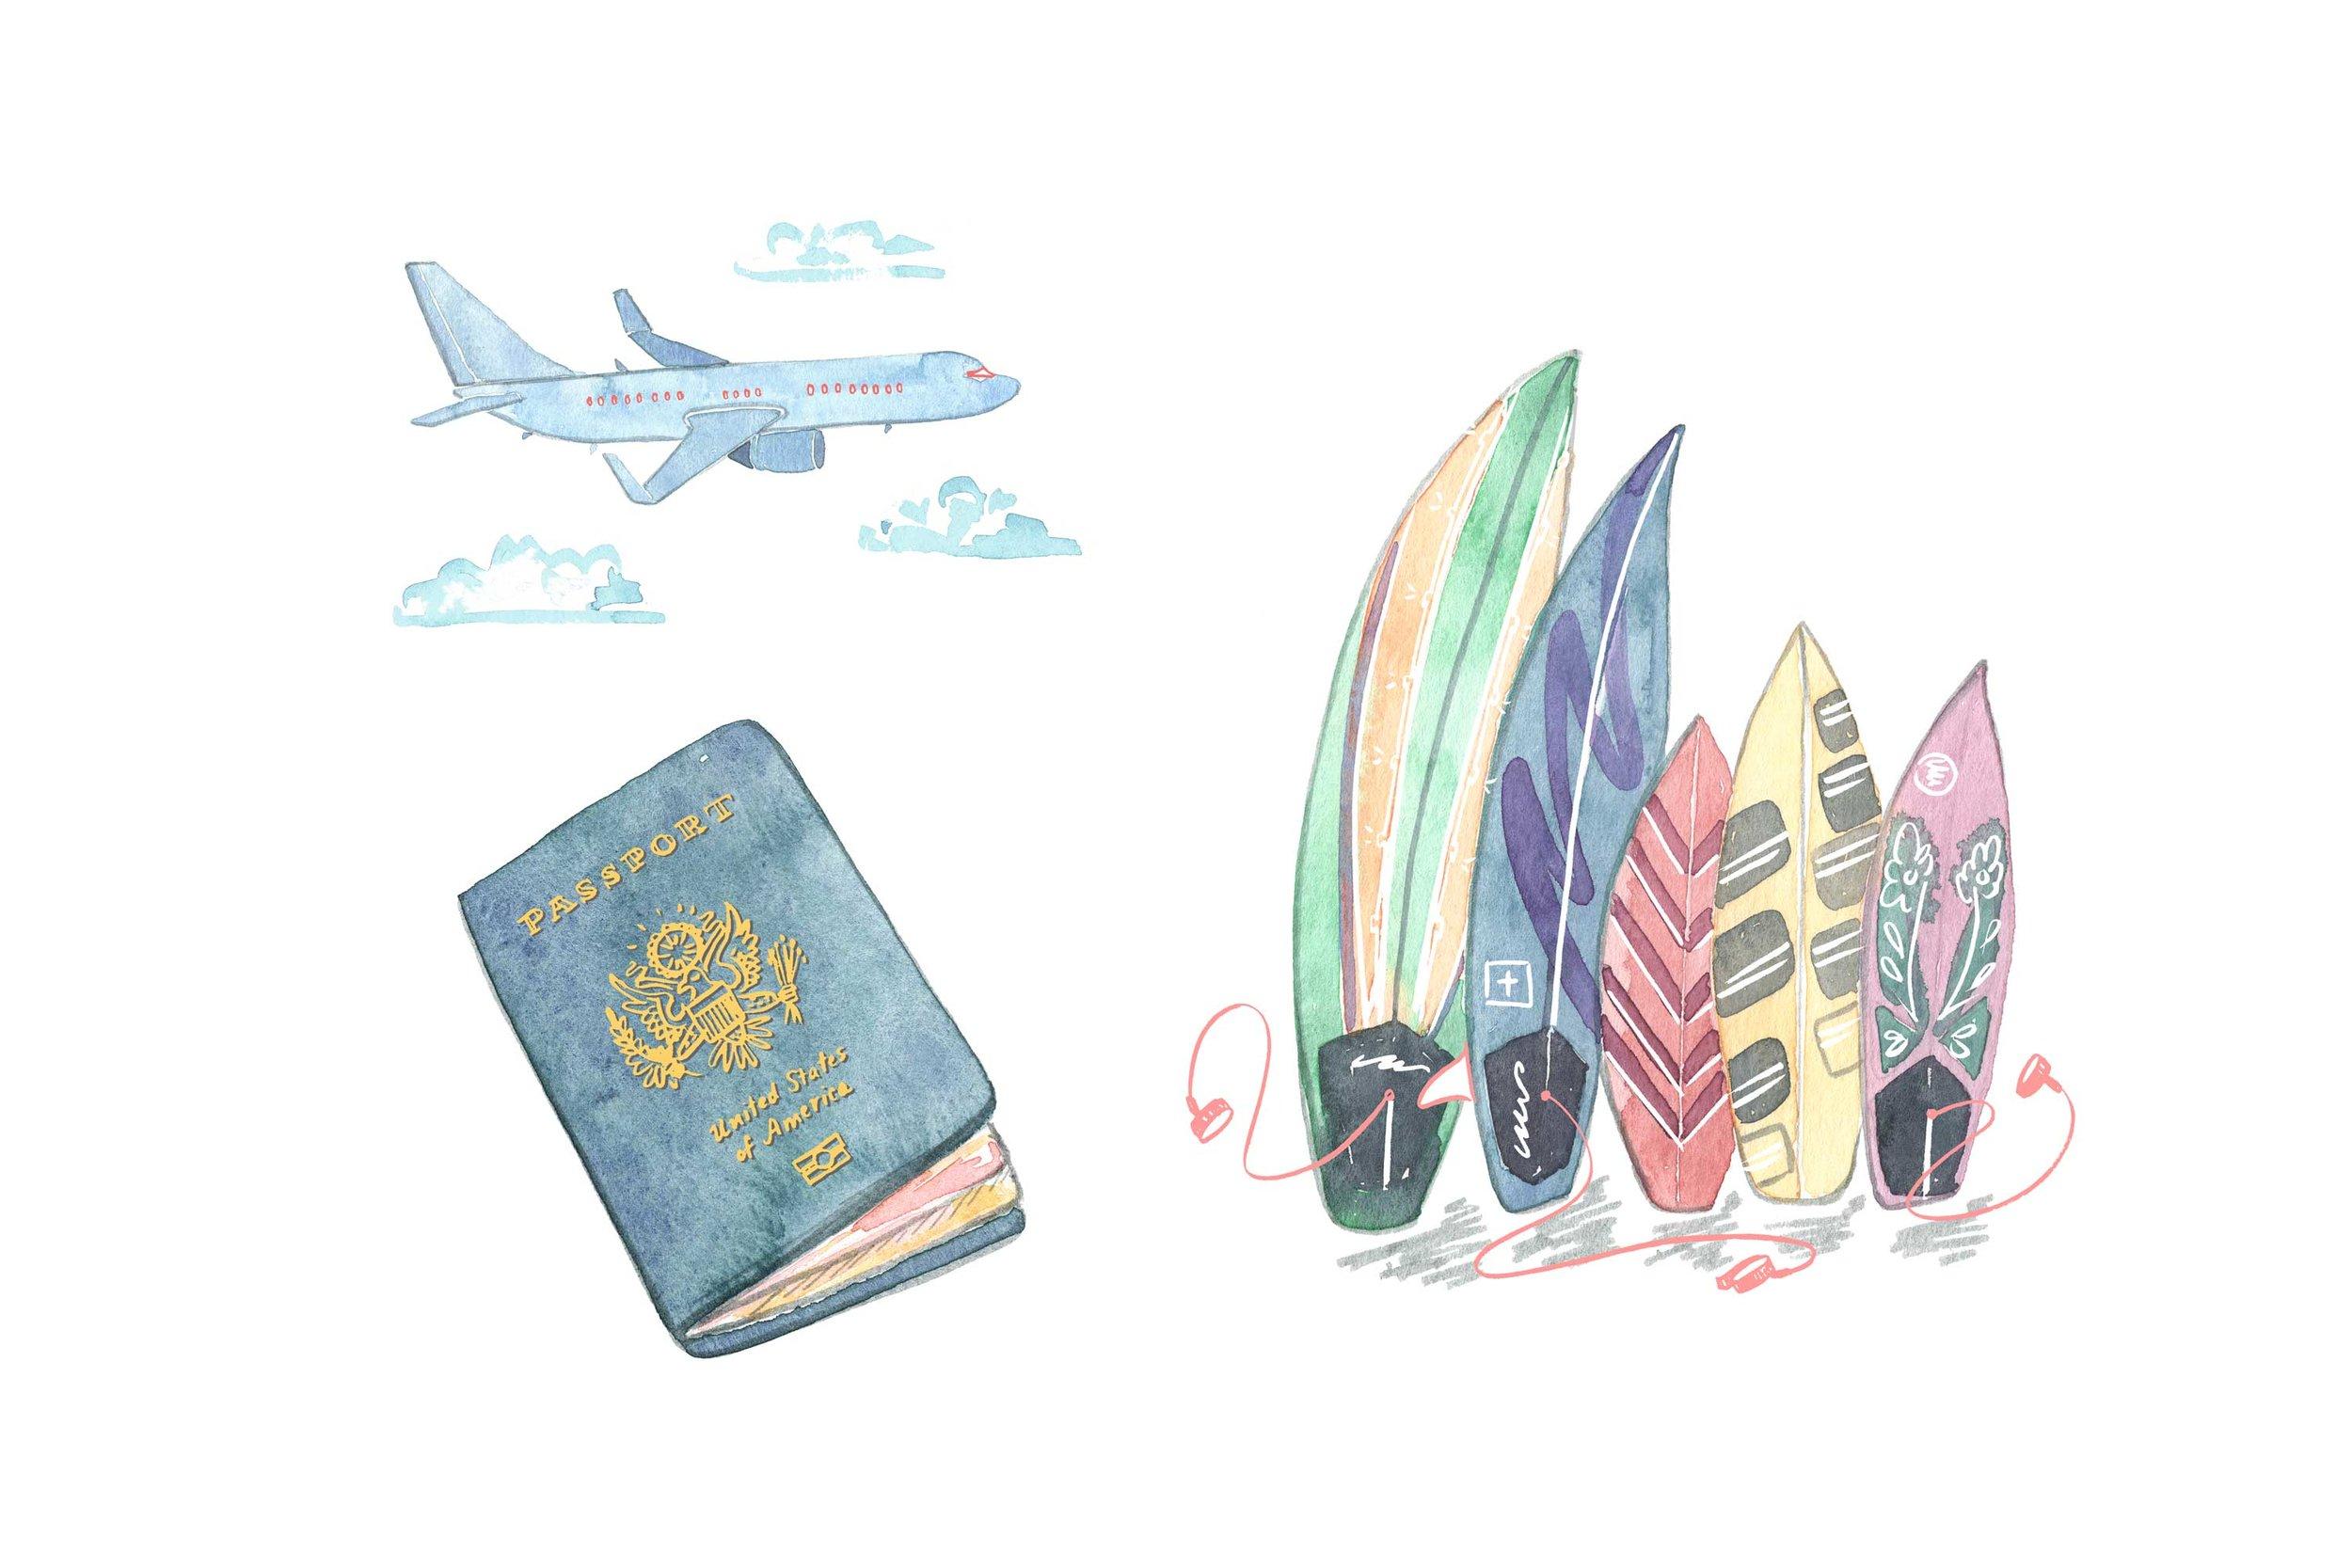 erin-ellis_lifestyle_watercolor_illustrations_travel_well+good.jpg